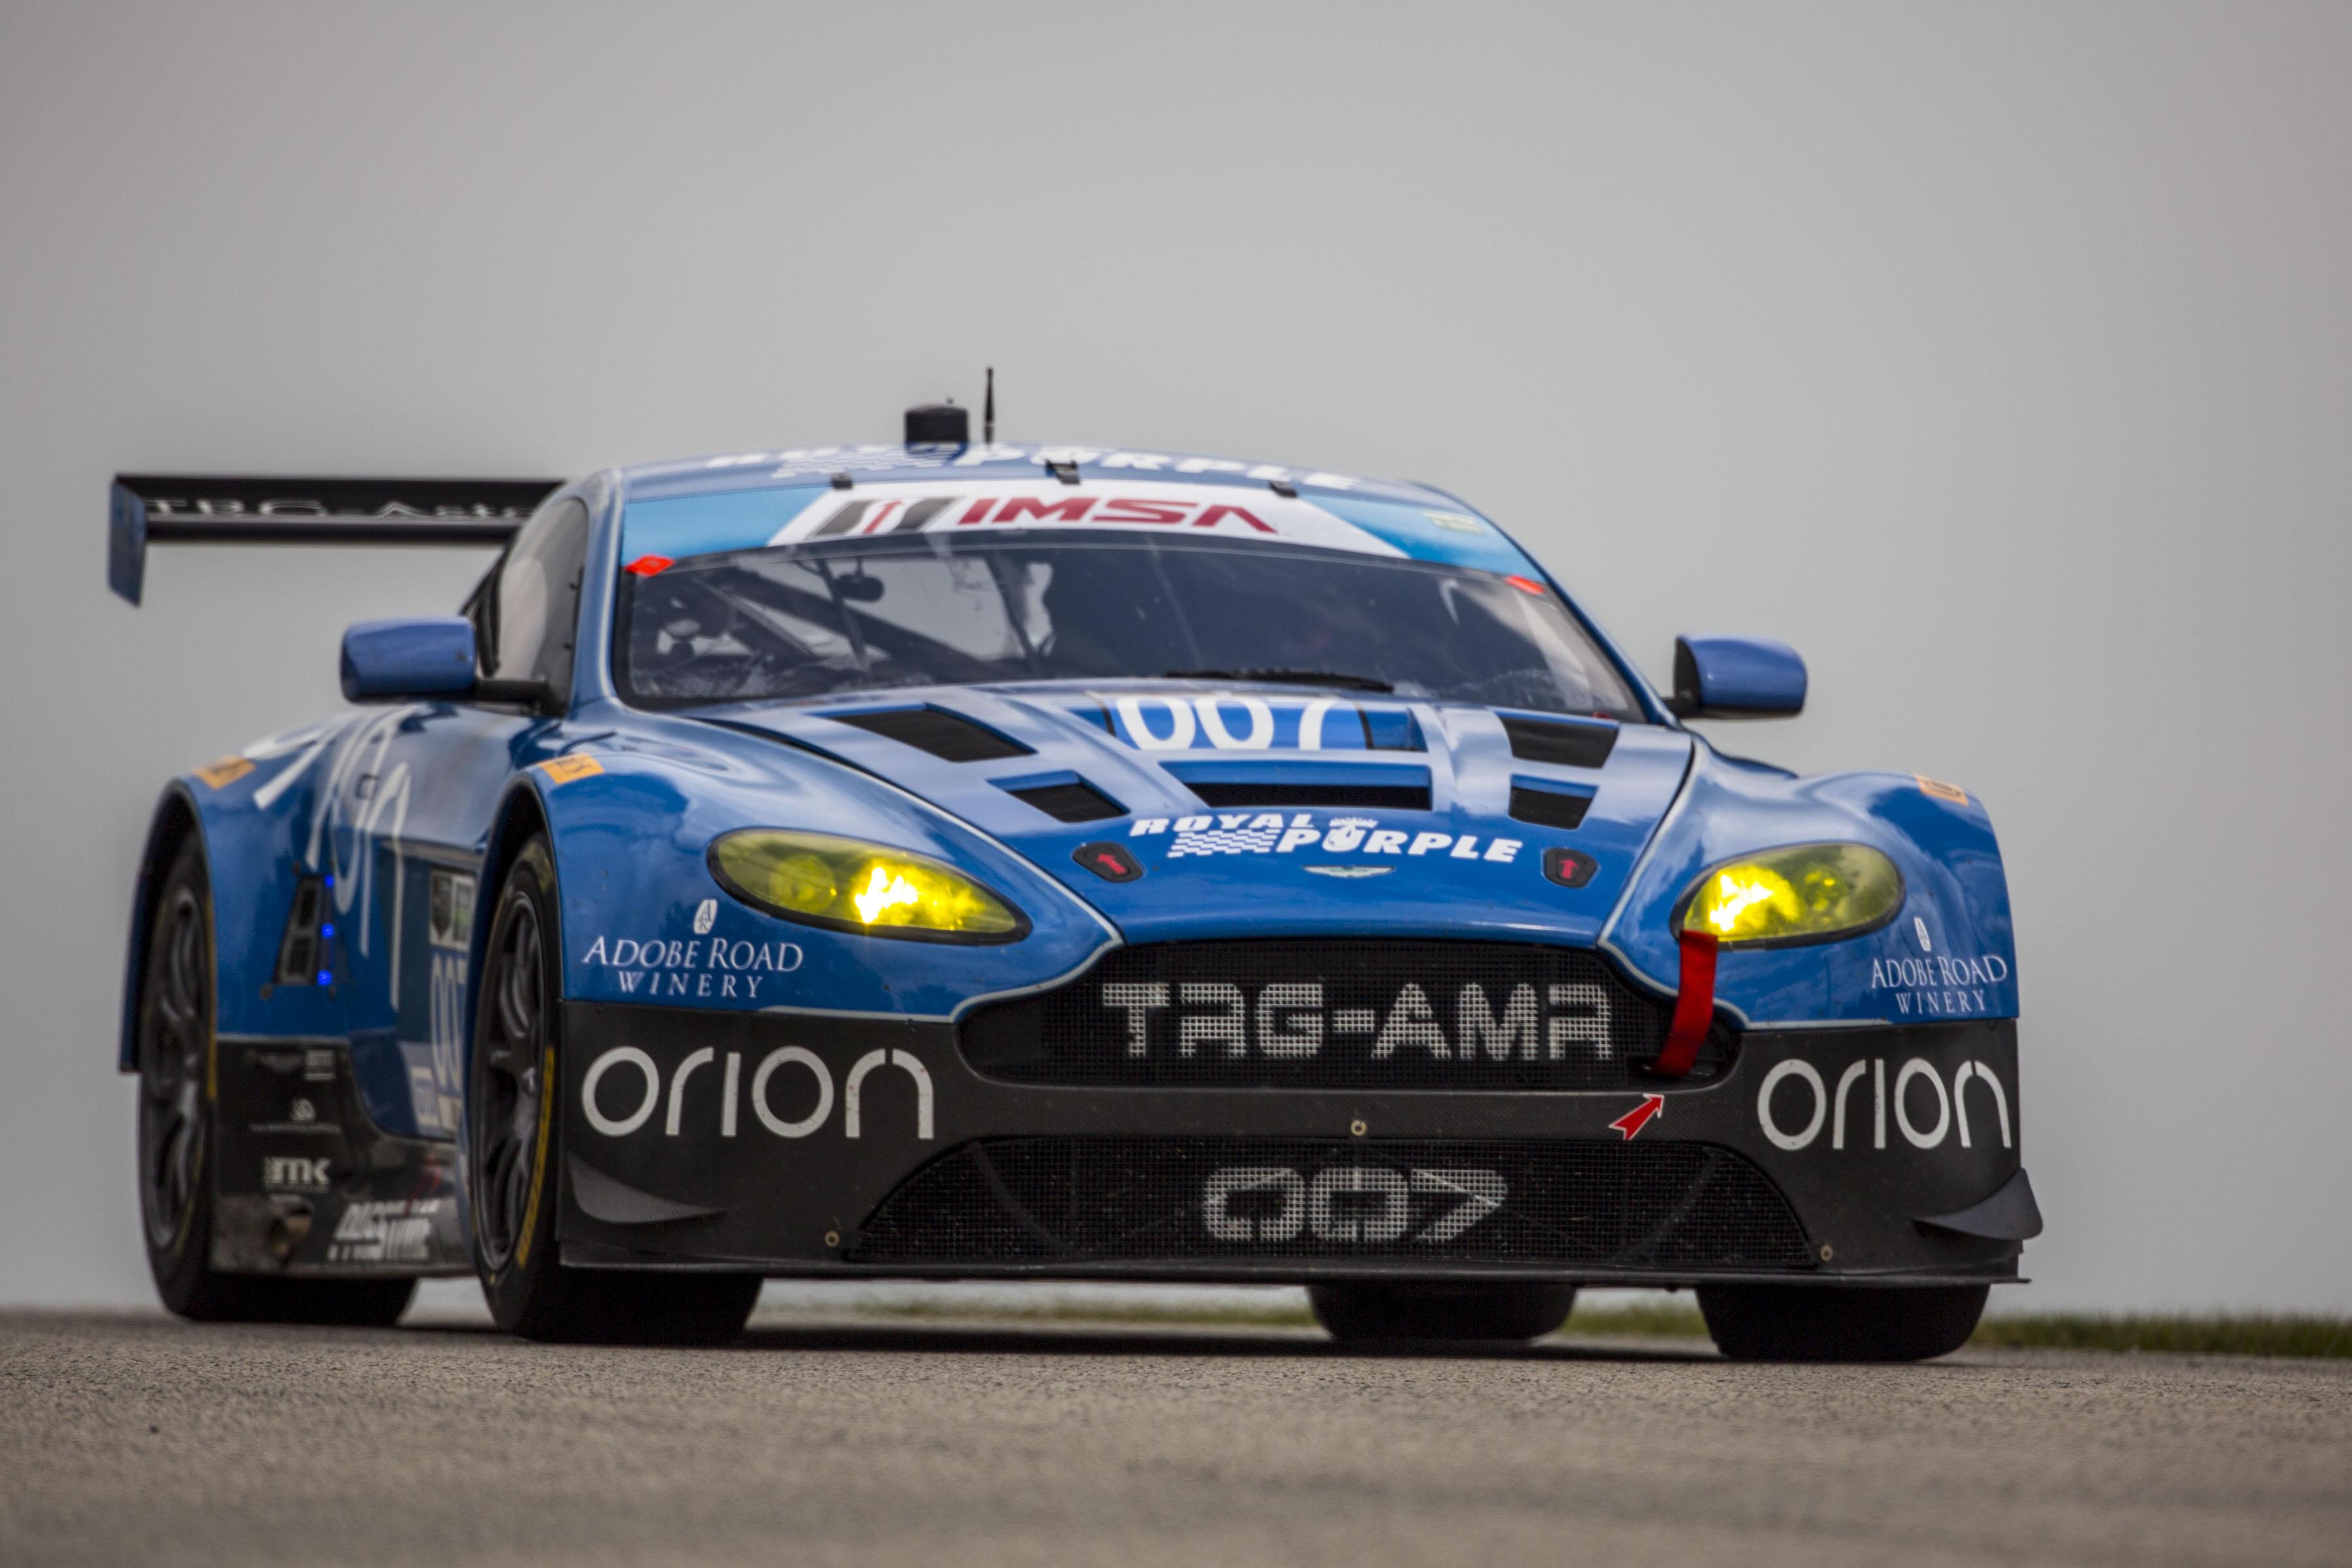 TRG-Aston Martin Racing take GTD series lead in Tudor United Sportscar Championship